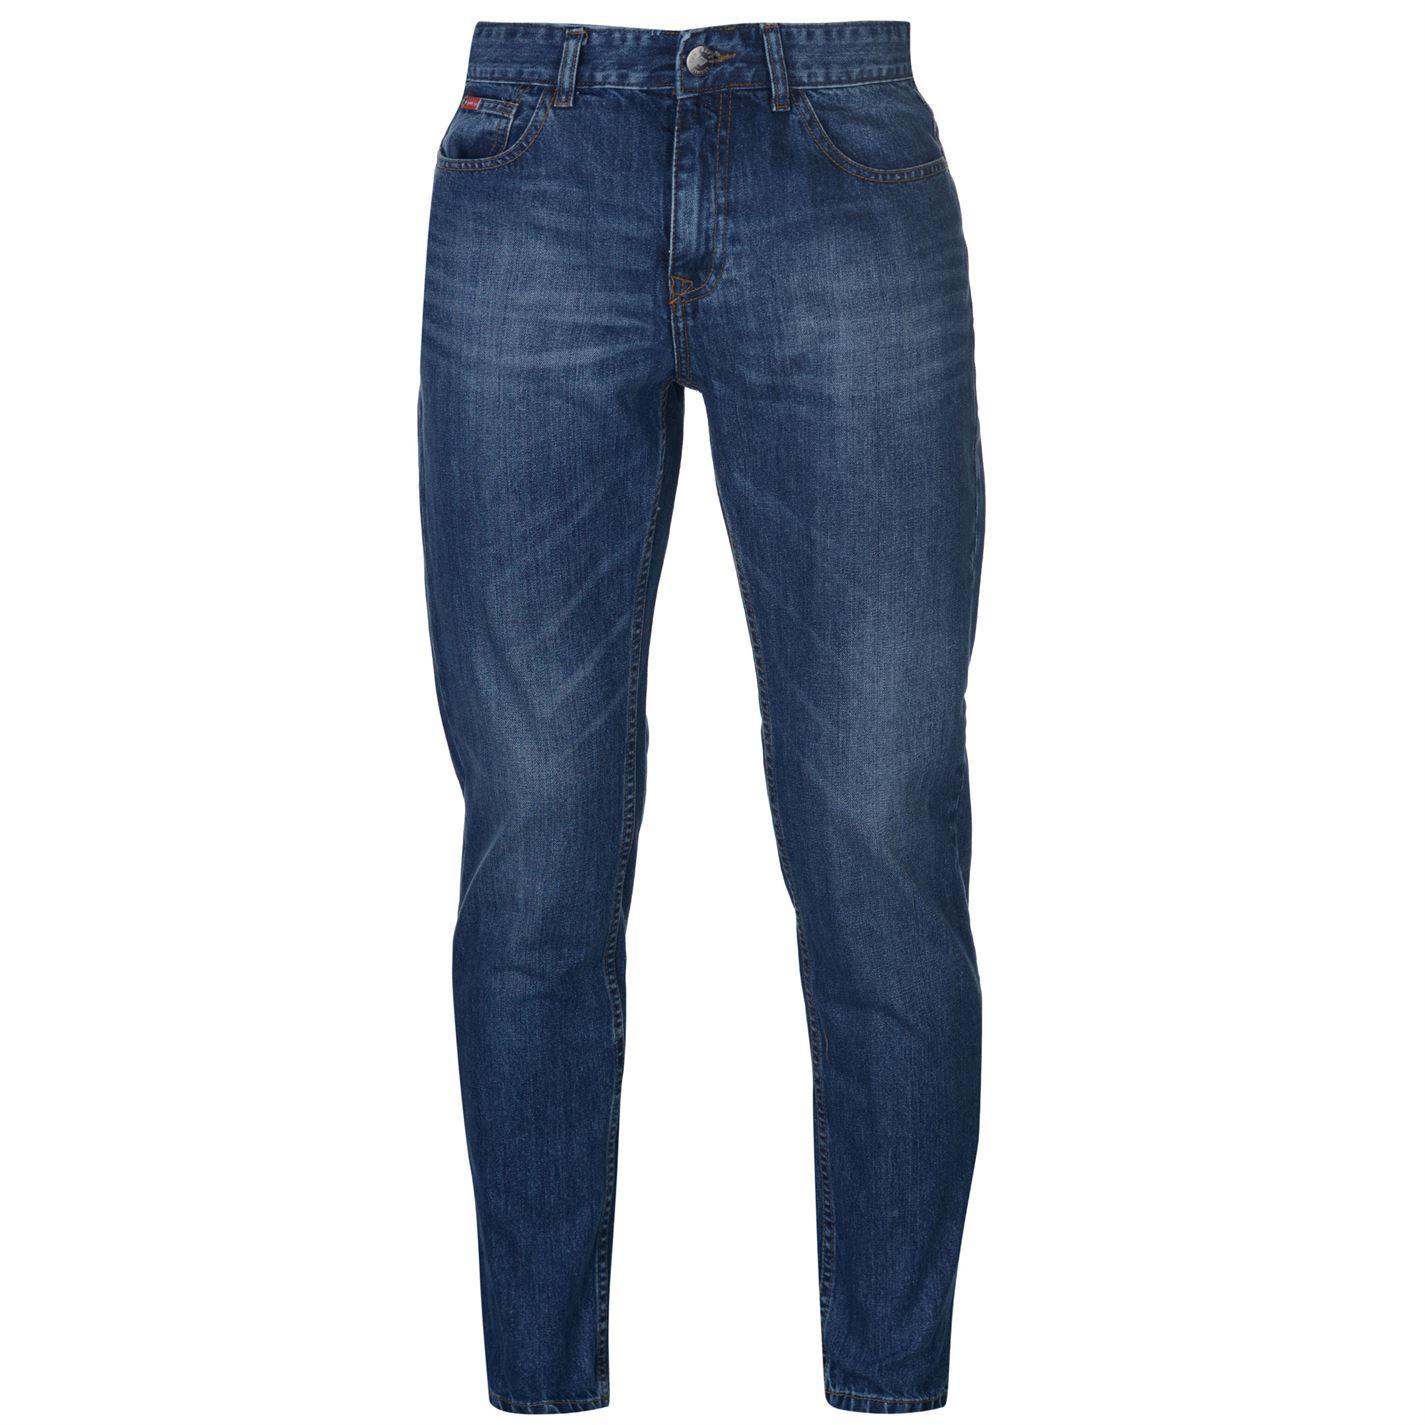 Džíny Lee Cooper Slim Leg Jeans Mens - Glami.cz 96c3e3722f